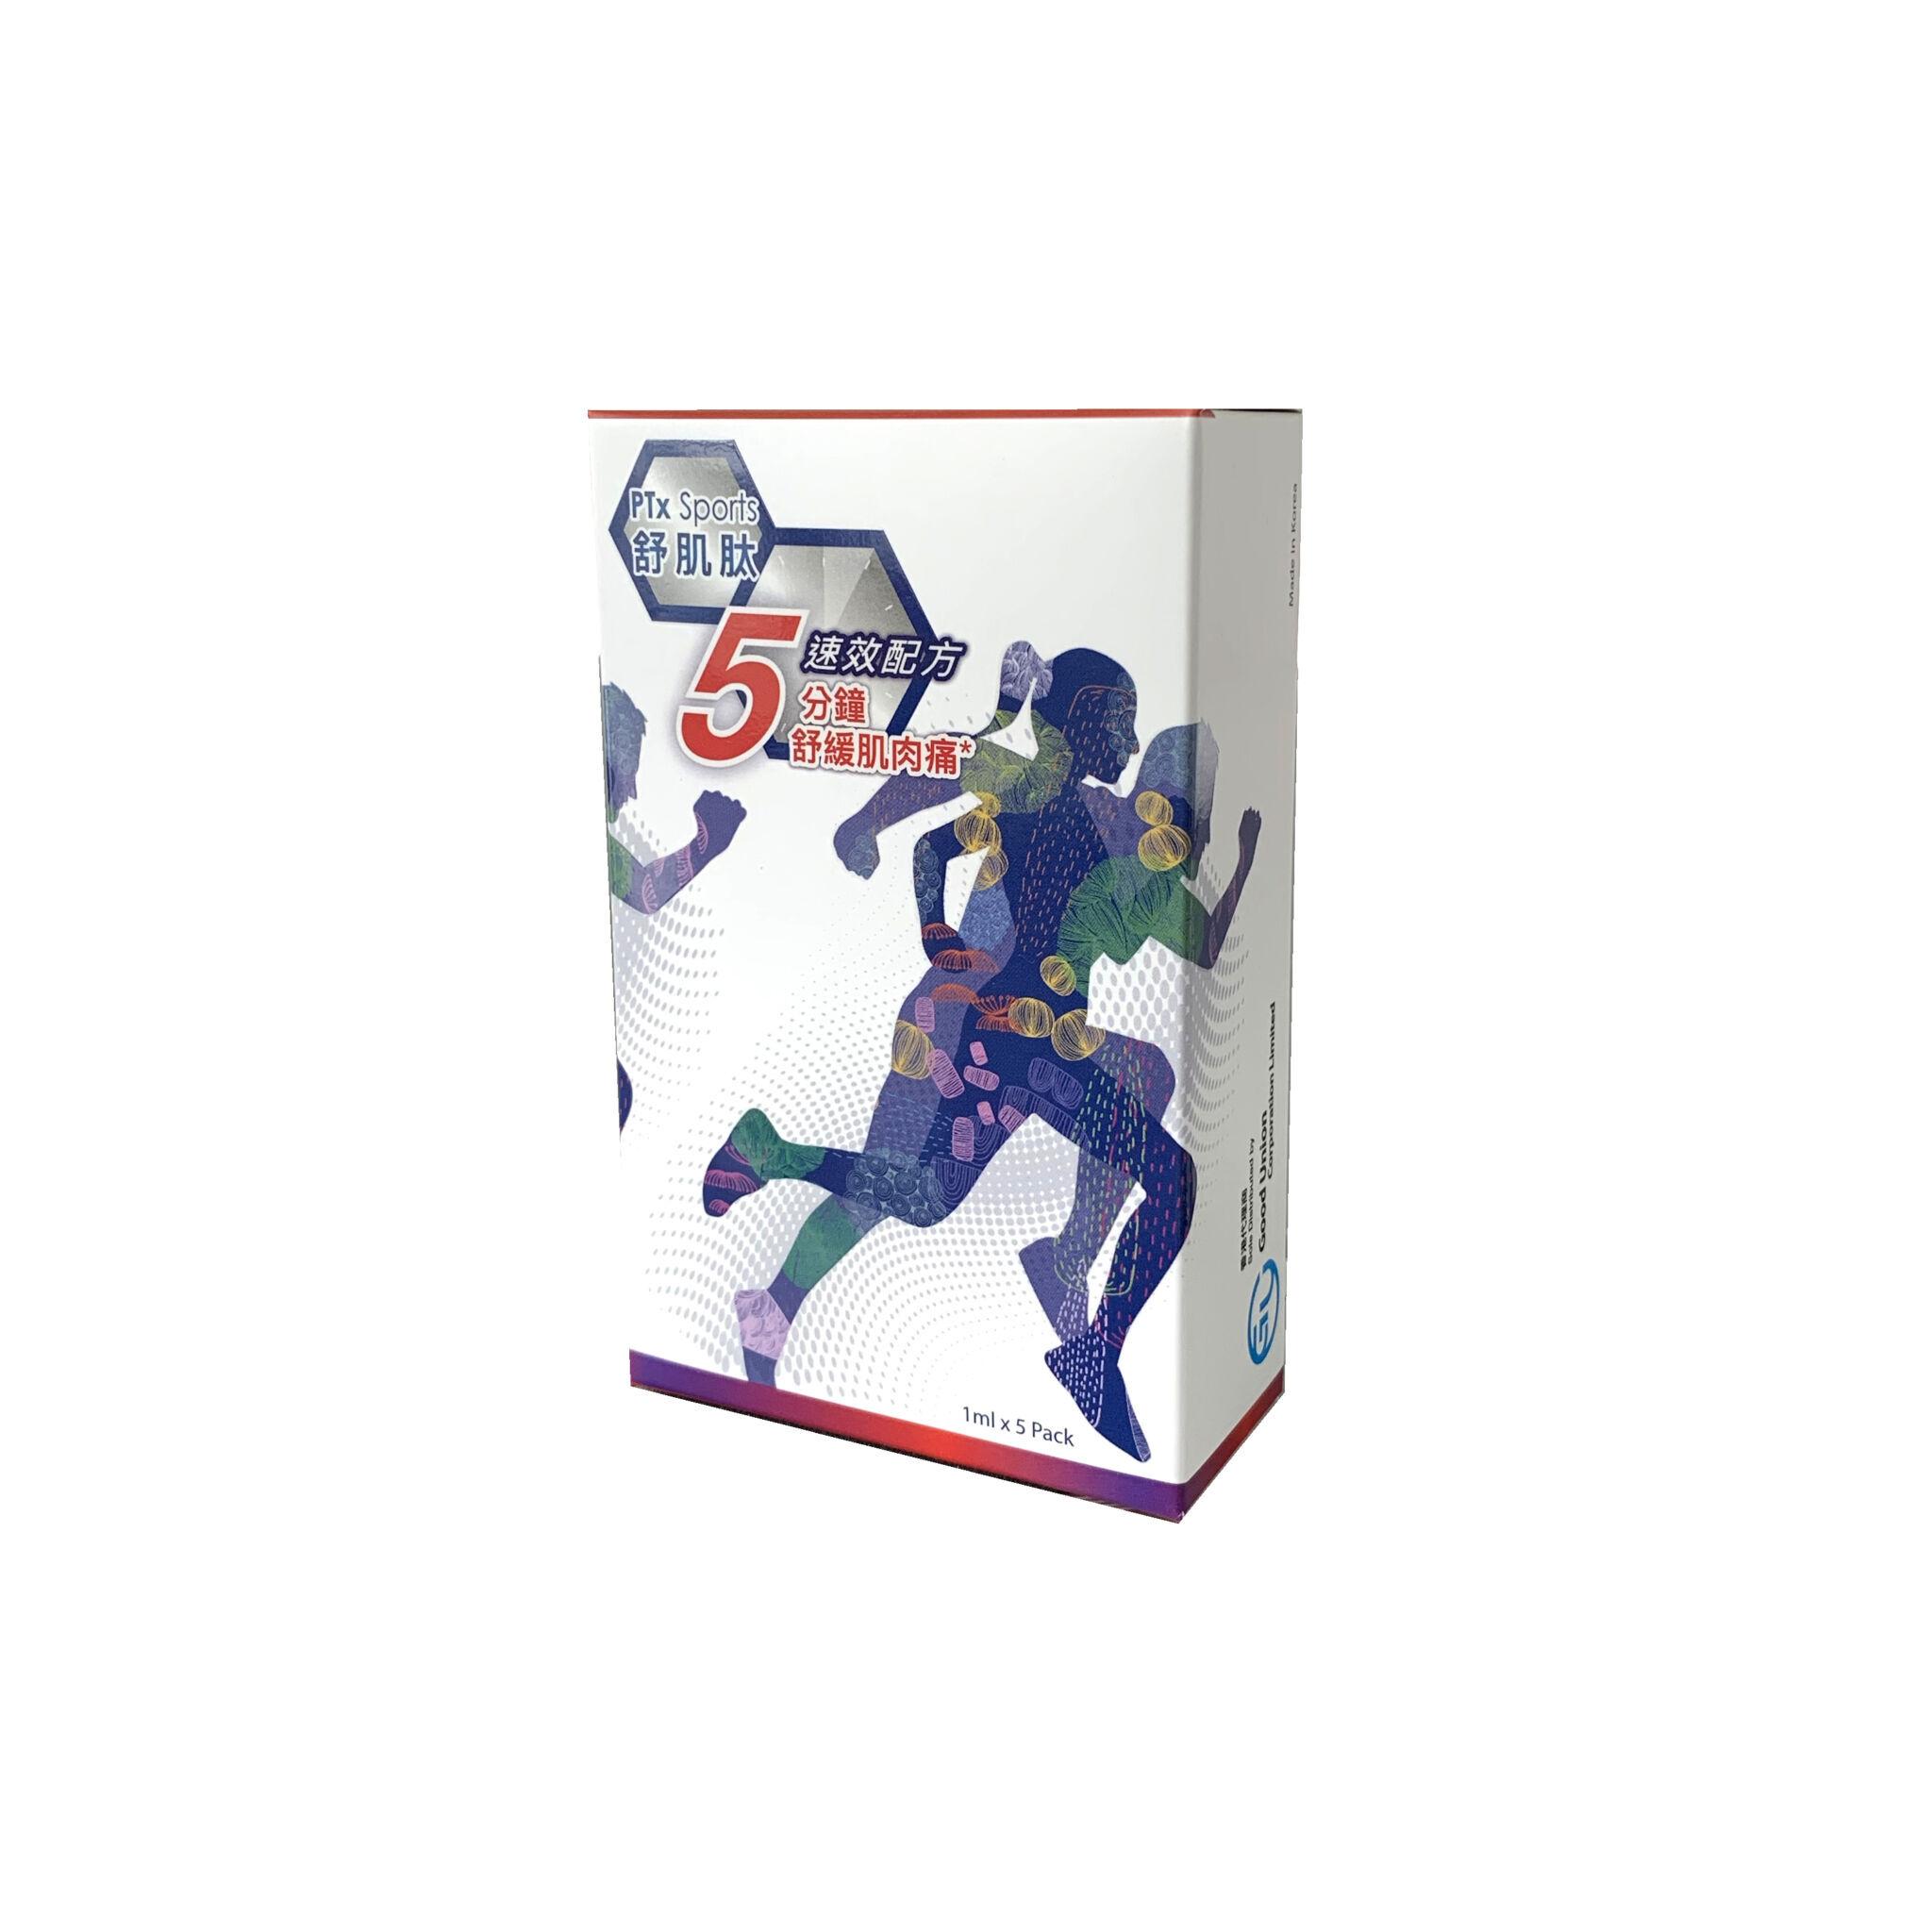 PTx Sports 強效舒肌肽 (包裝版)